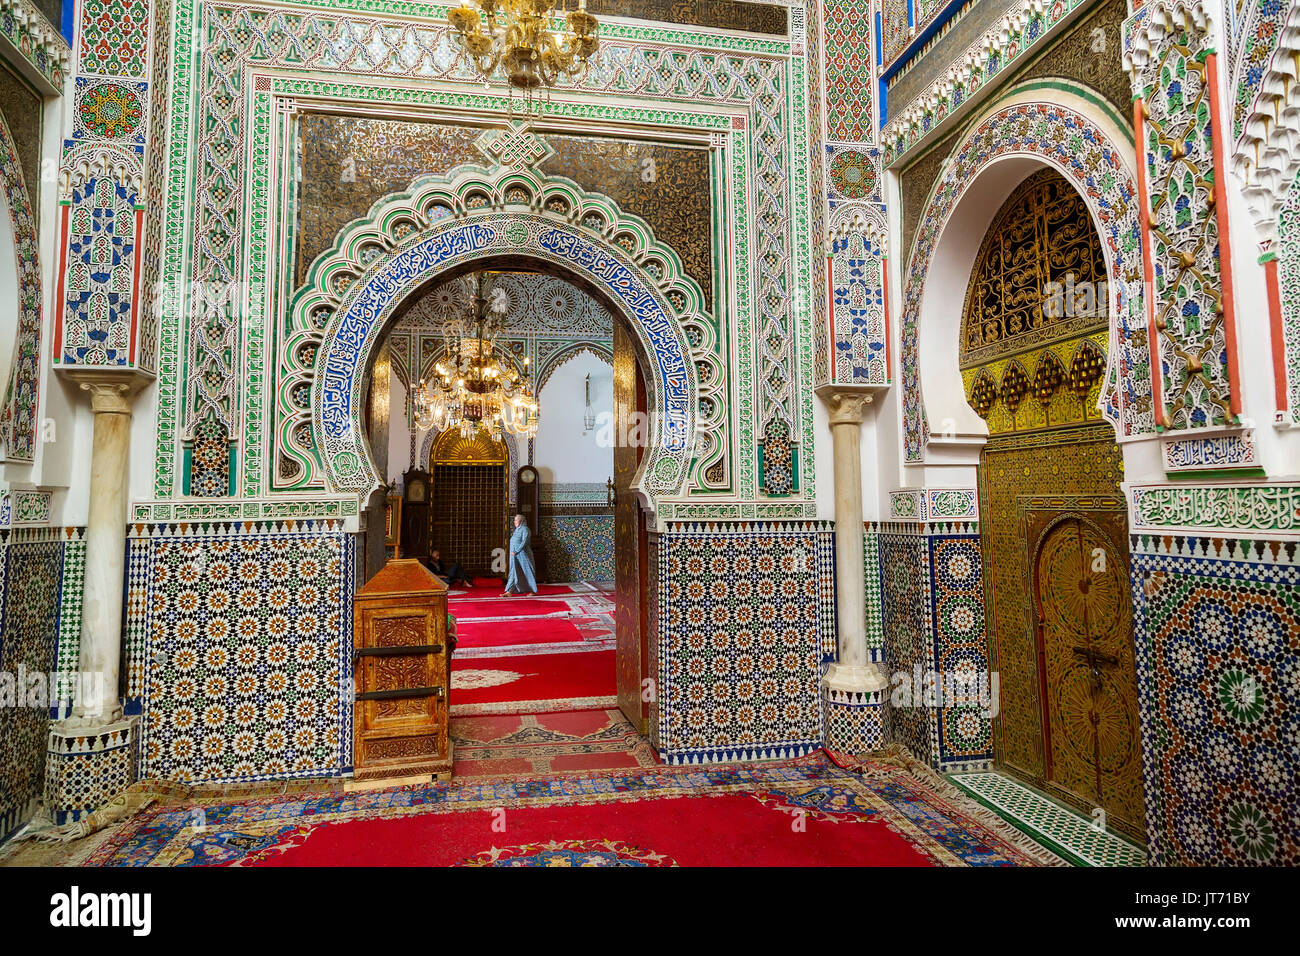 Moulay Idriss II Moschea. Souk Medina di Fez, Fes el Bali. Il Marocco, Maghreb Nord Africa Immagini Stock